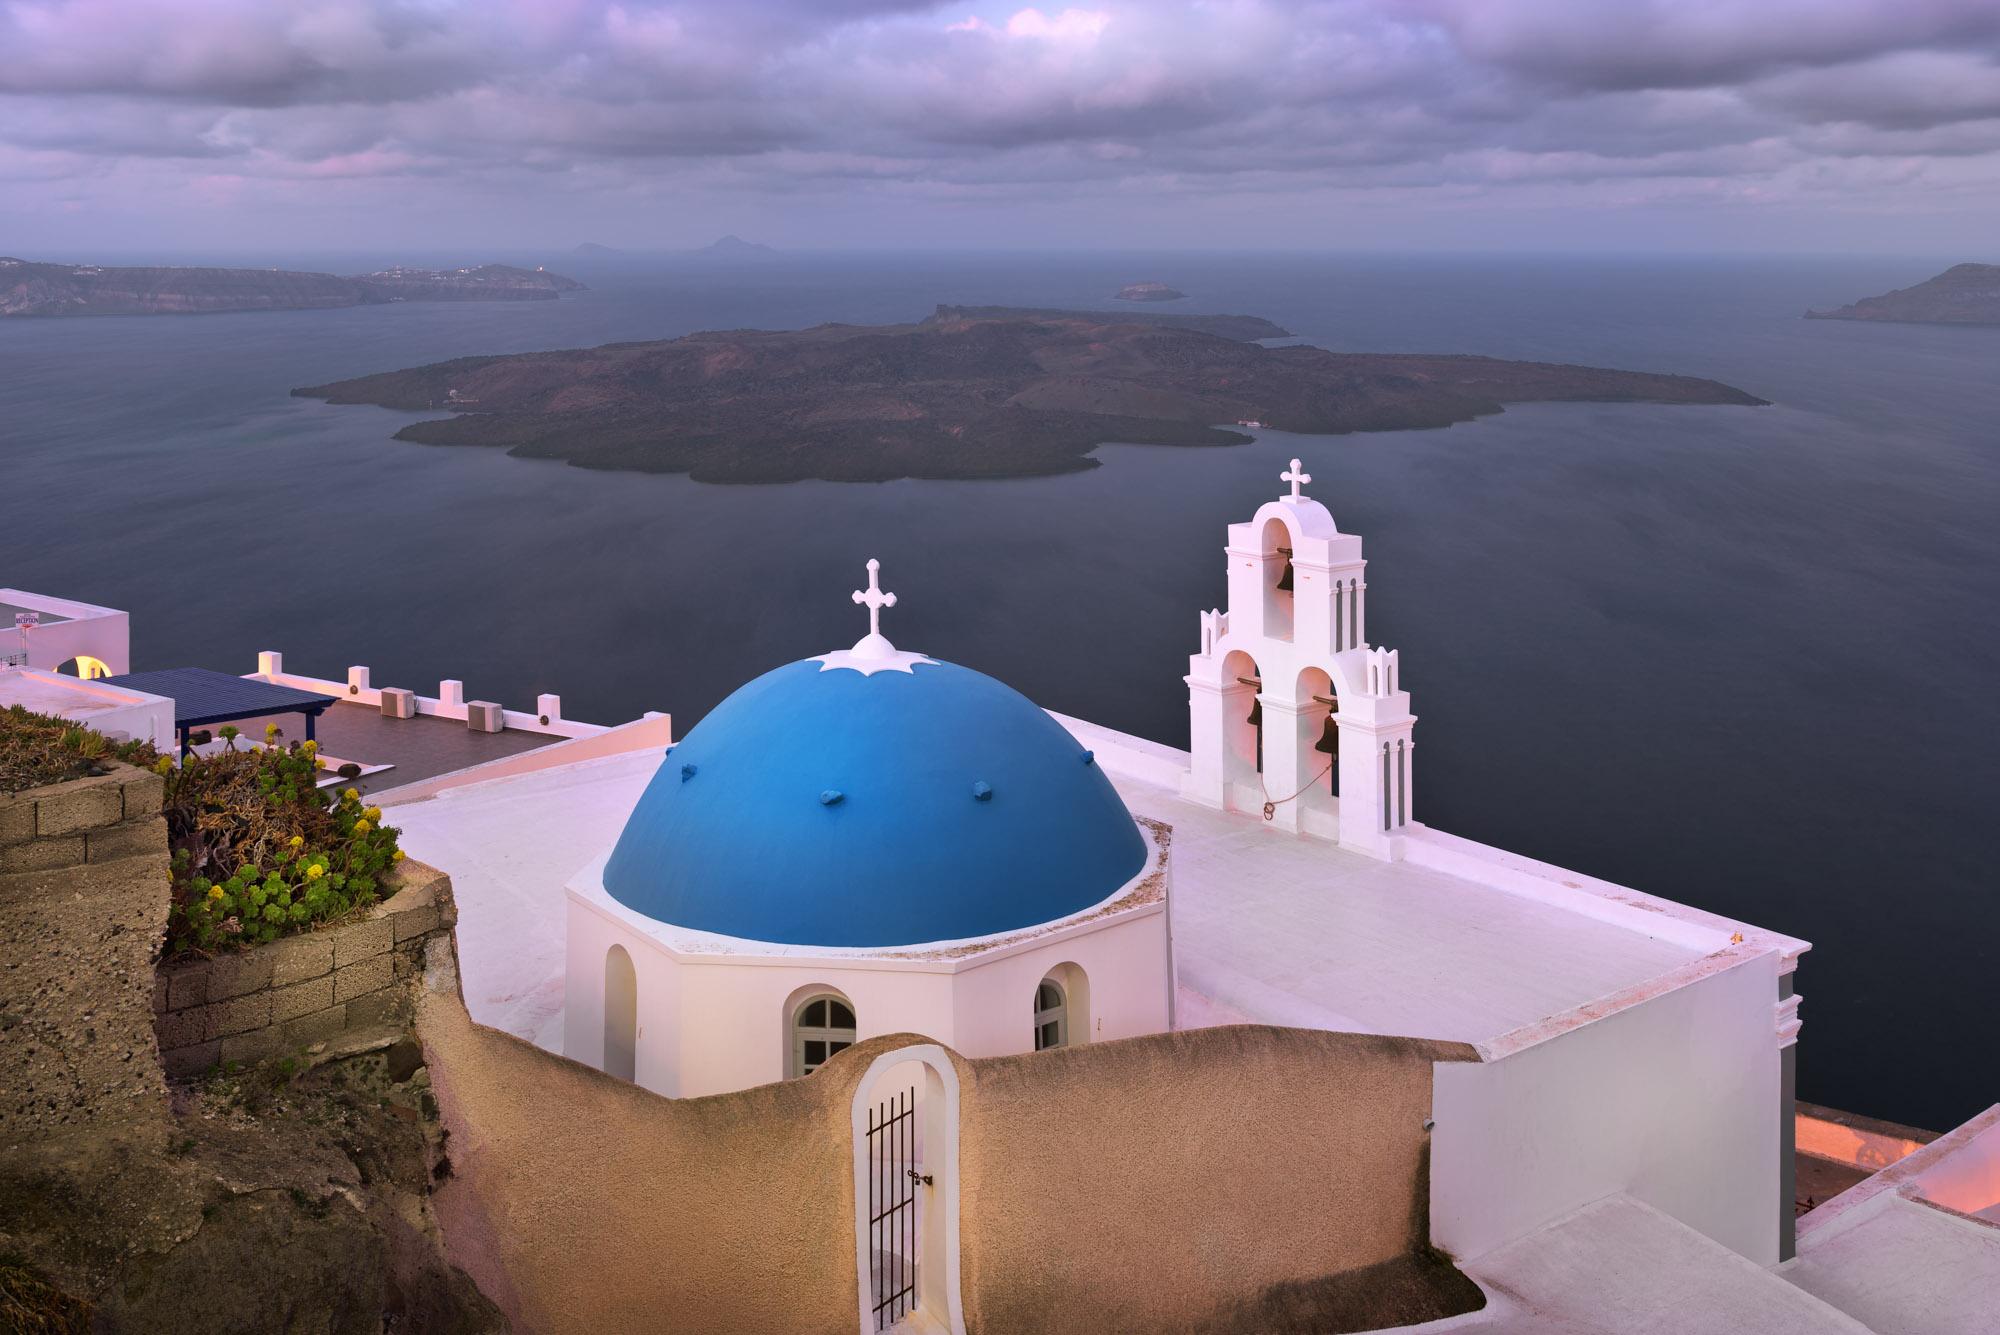 Saint Theodore Church in the Morning, Fira, Santorini, Greece